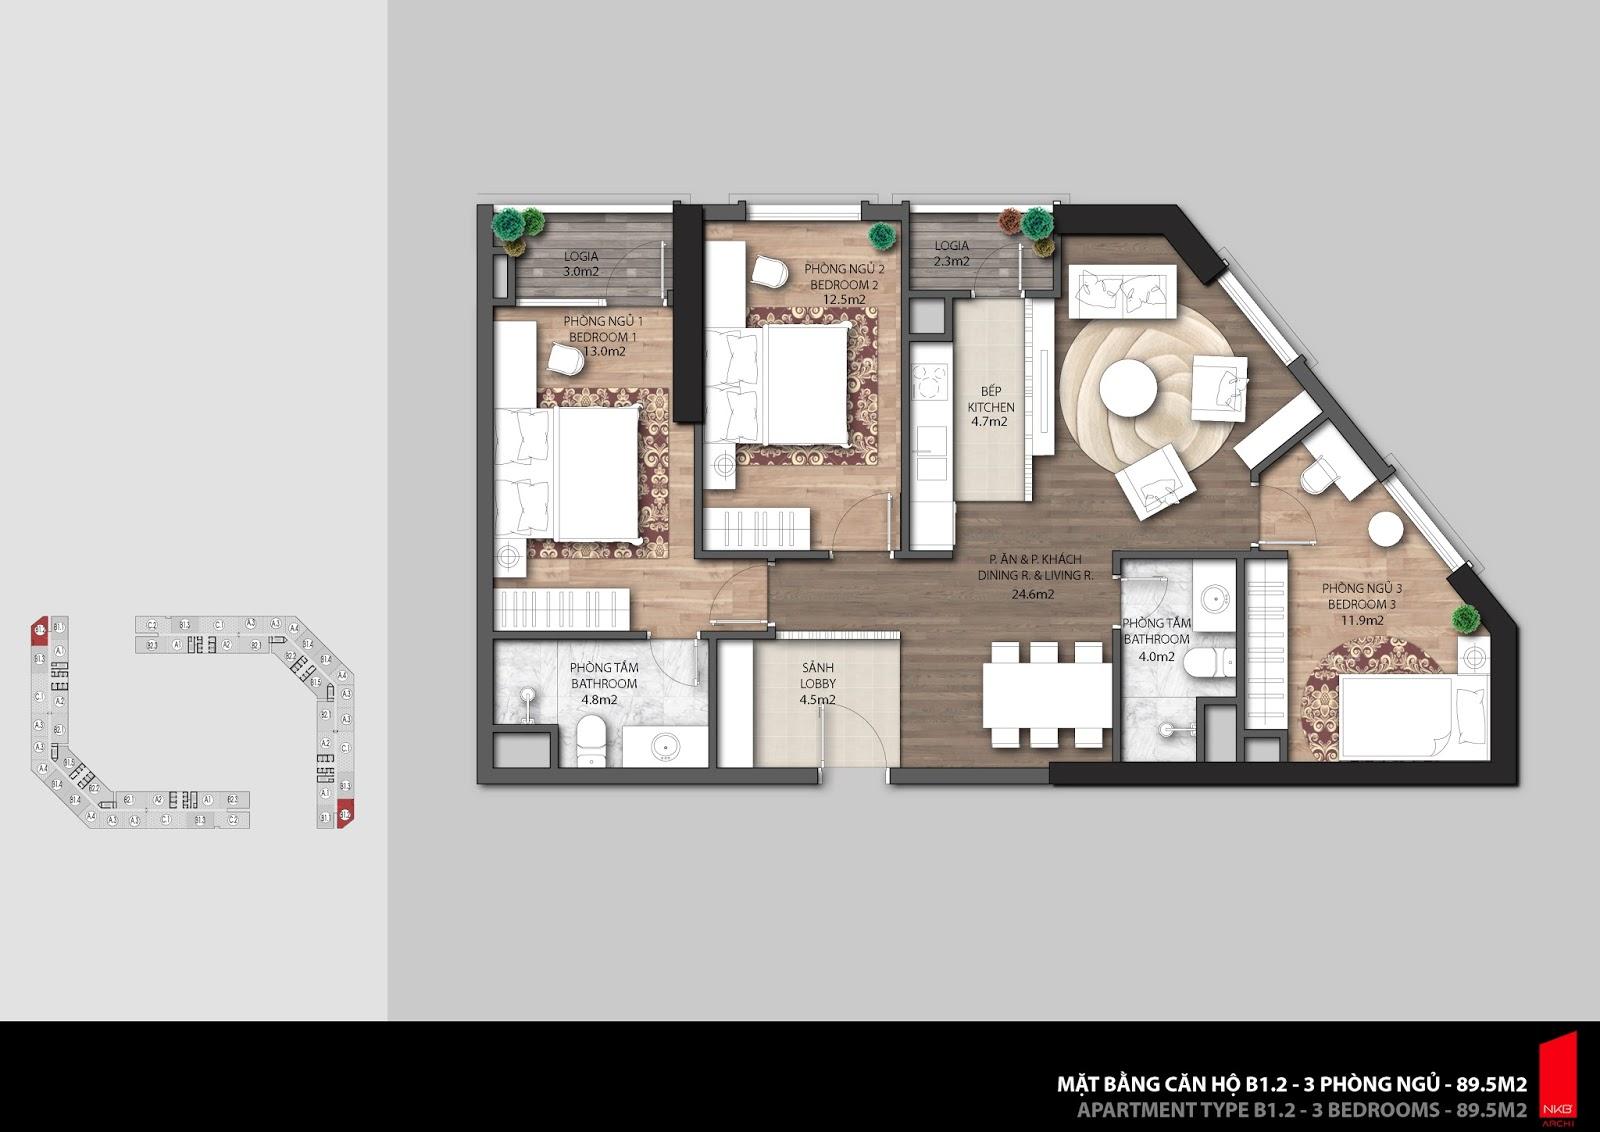 Mặt bằng căn hộ 89,5m2